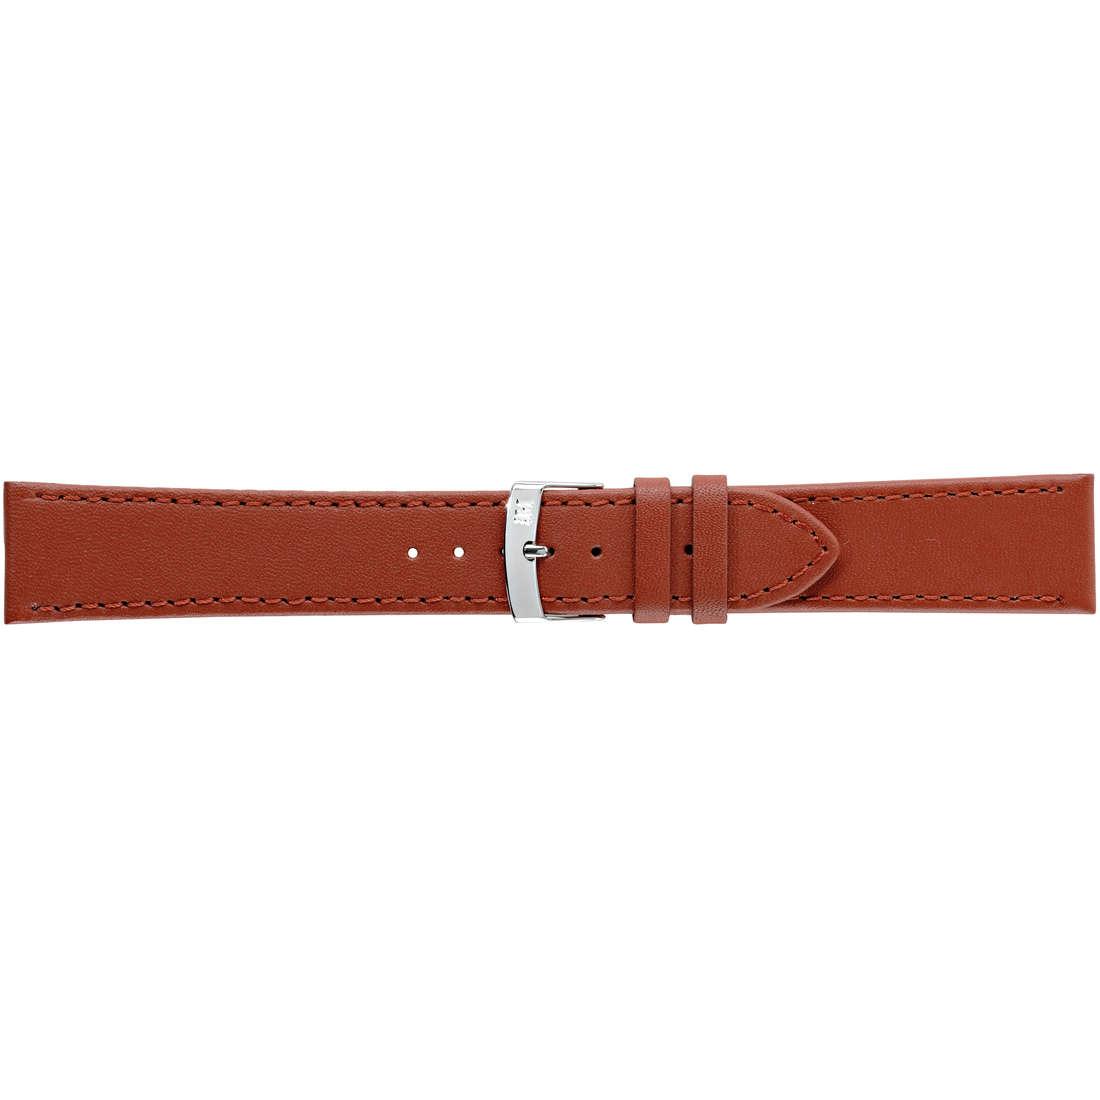 watch watch bands watch straps man Morellato Performance A01X2619875141CR12